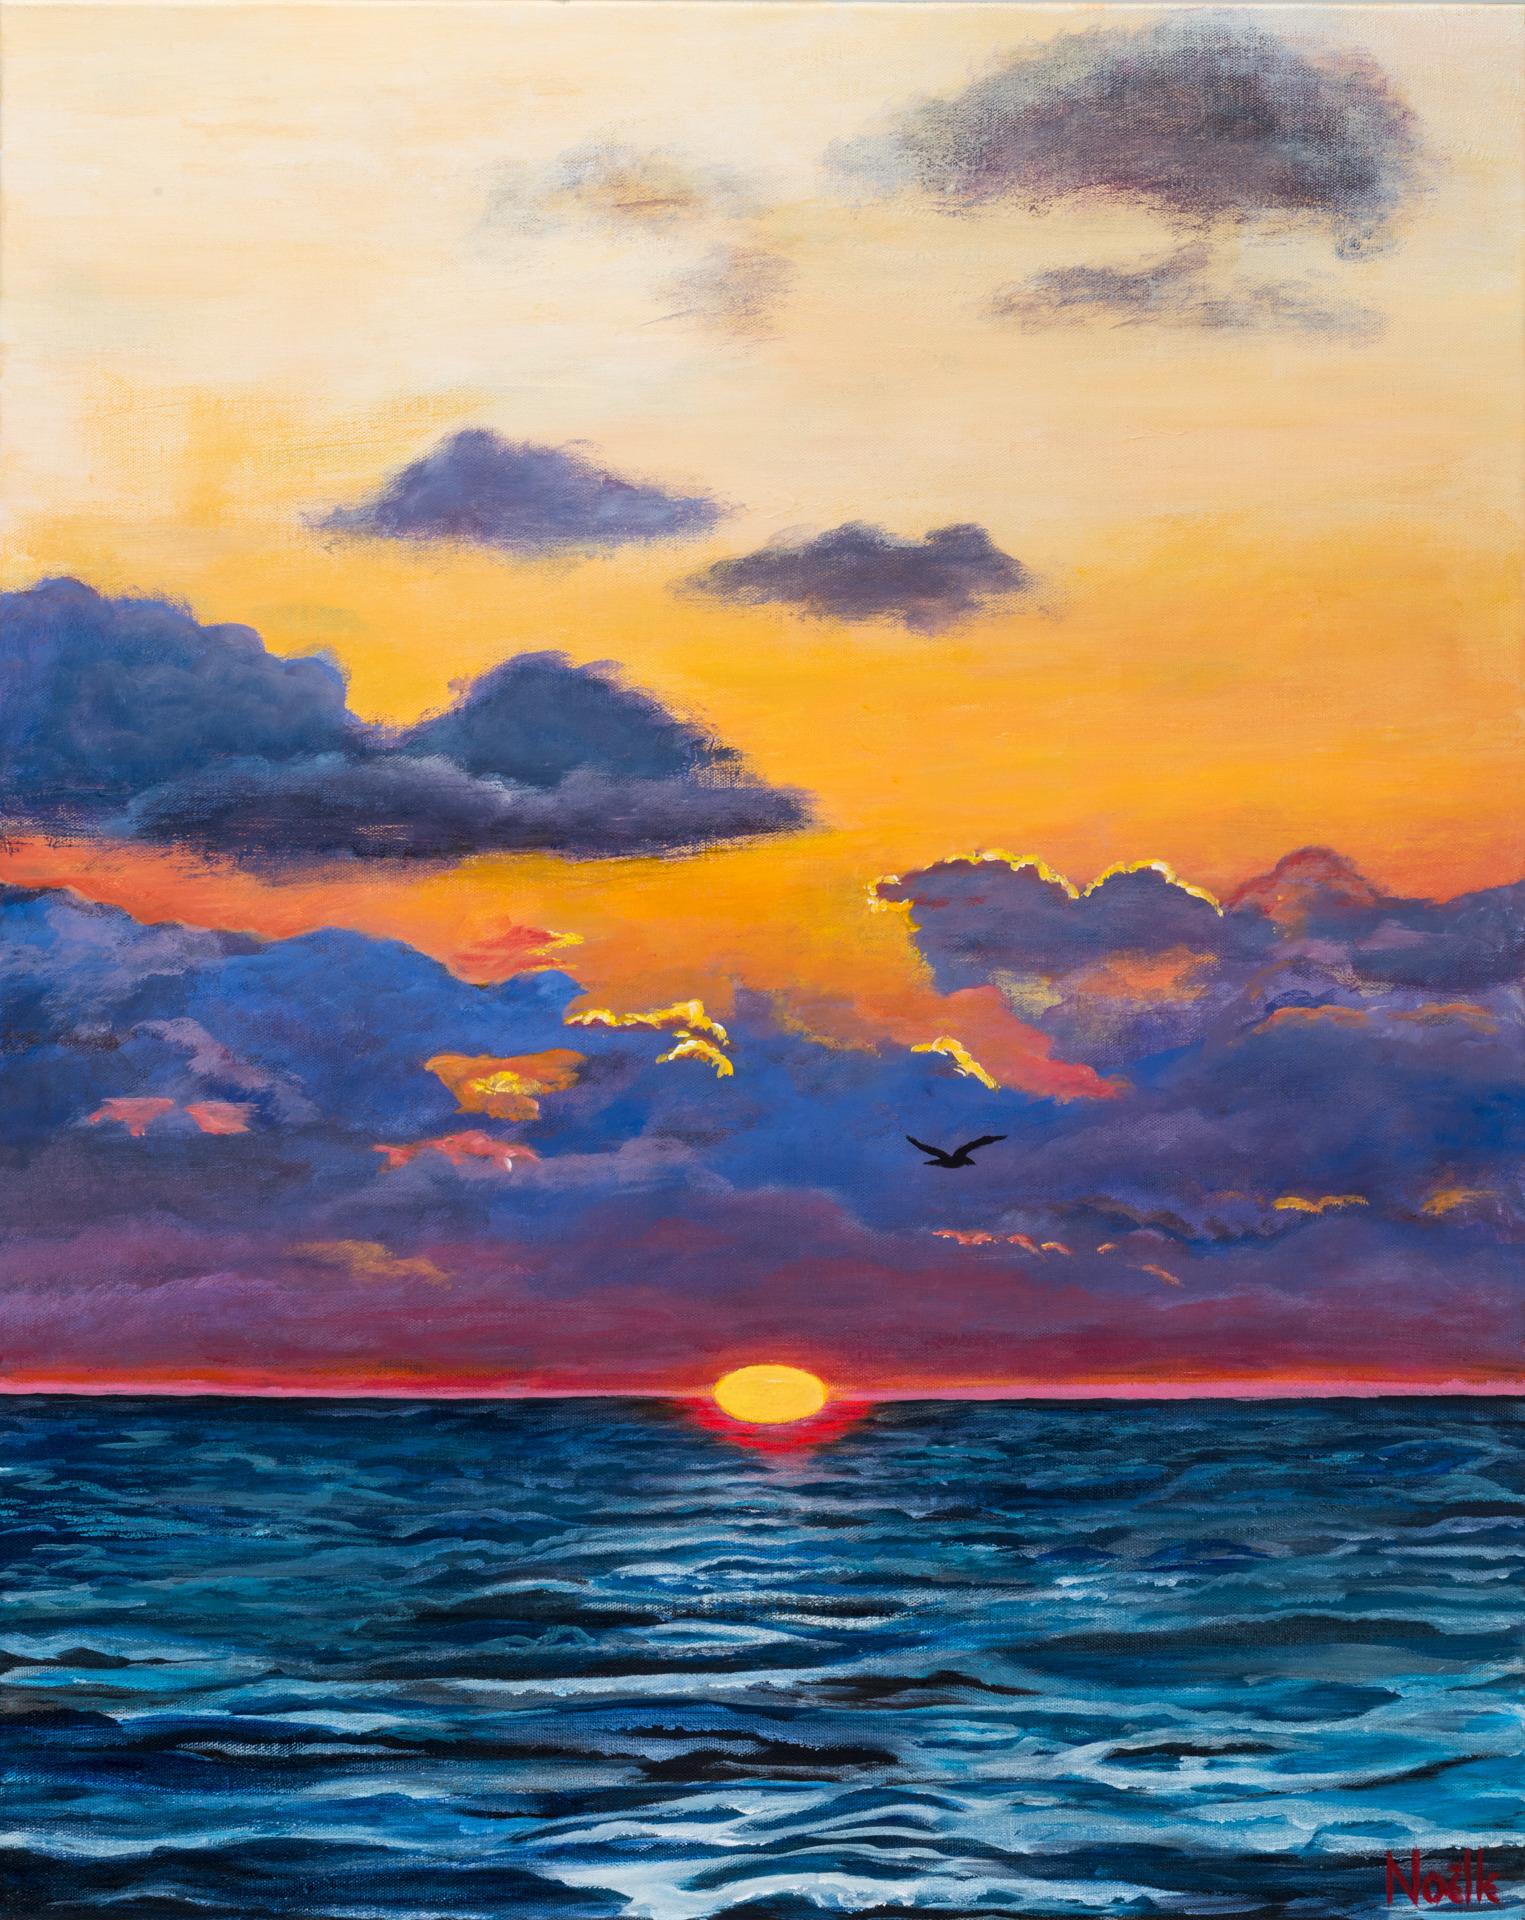 Noelle mccarthy new year s sunrise acrylic 24x30 1 000.00 eennof